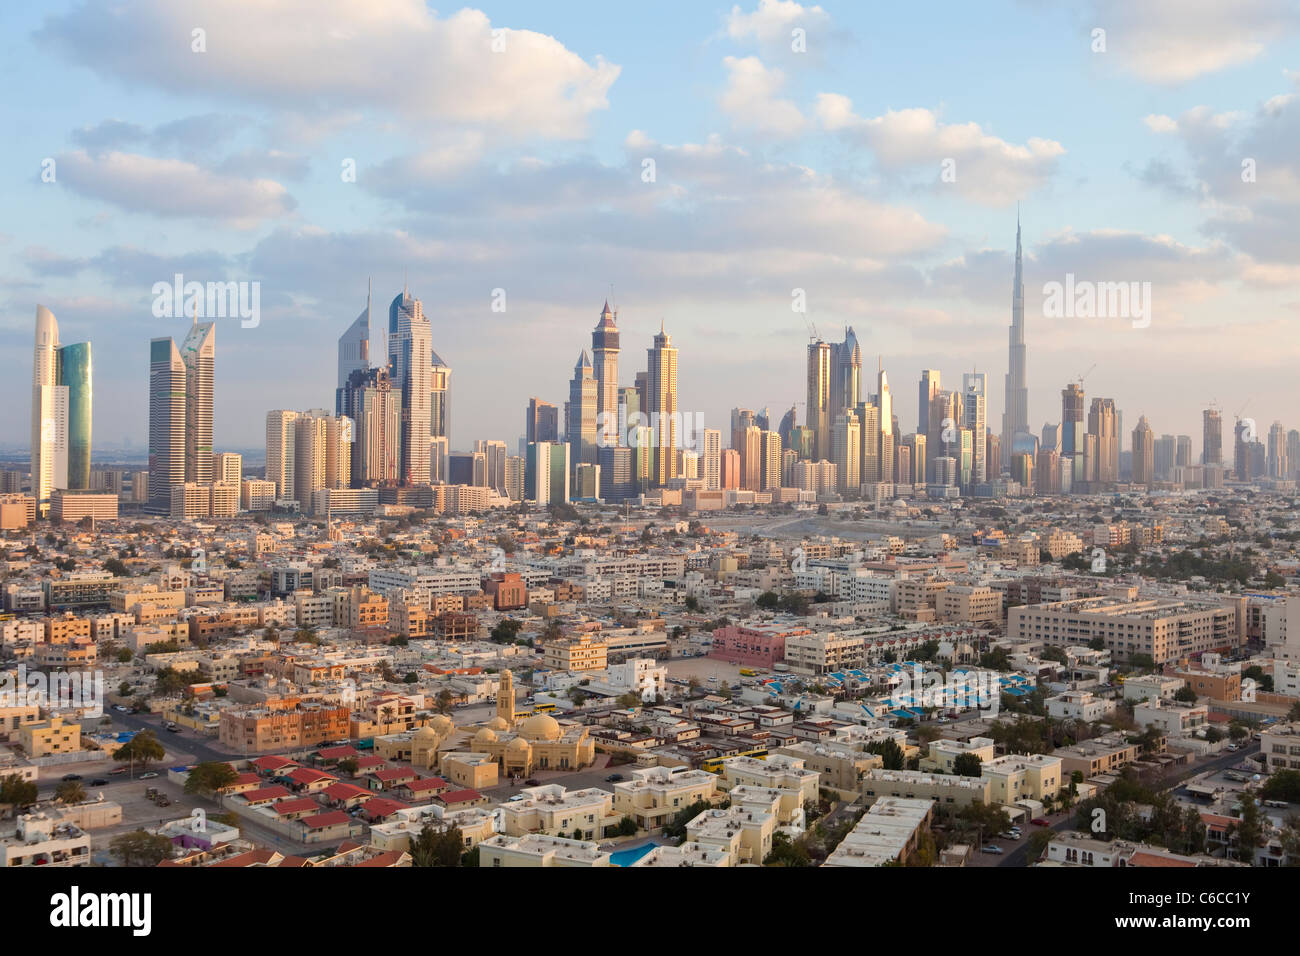 United Arab Emirates, Dubai, elevated view of the new Dubai skyline including the Burj Khalifa - Stock Image